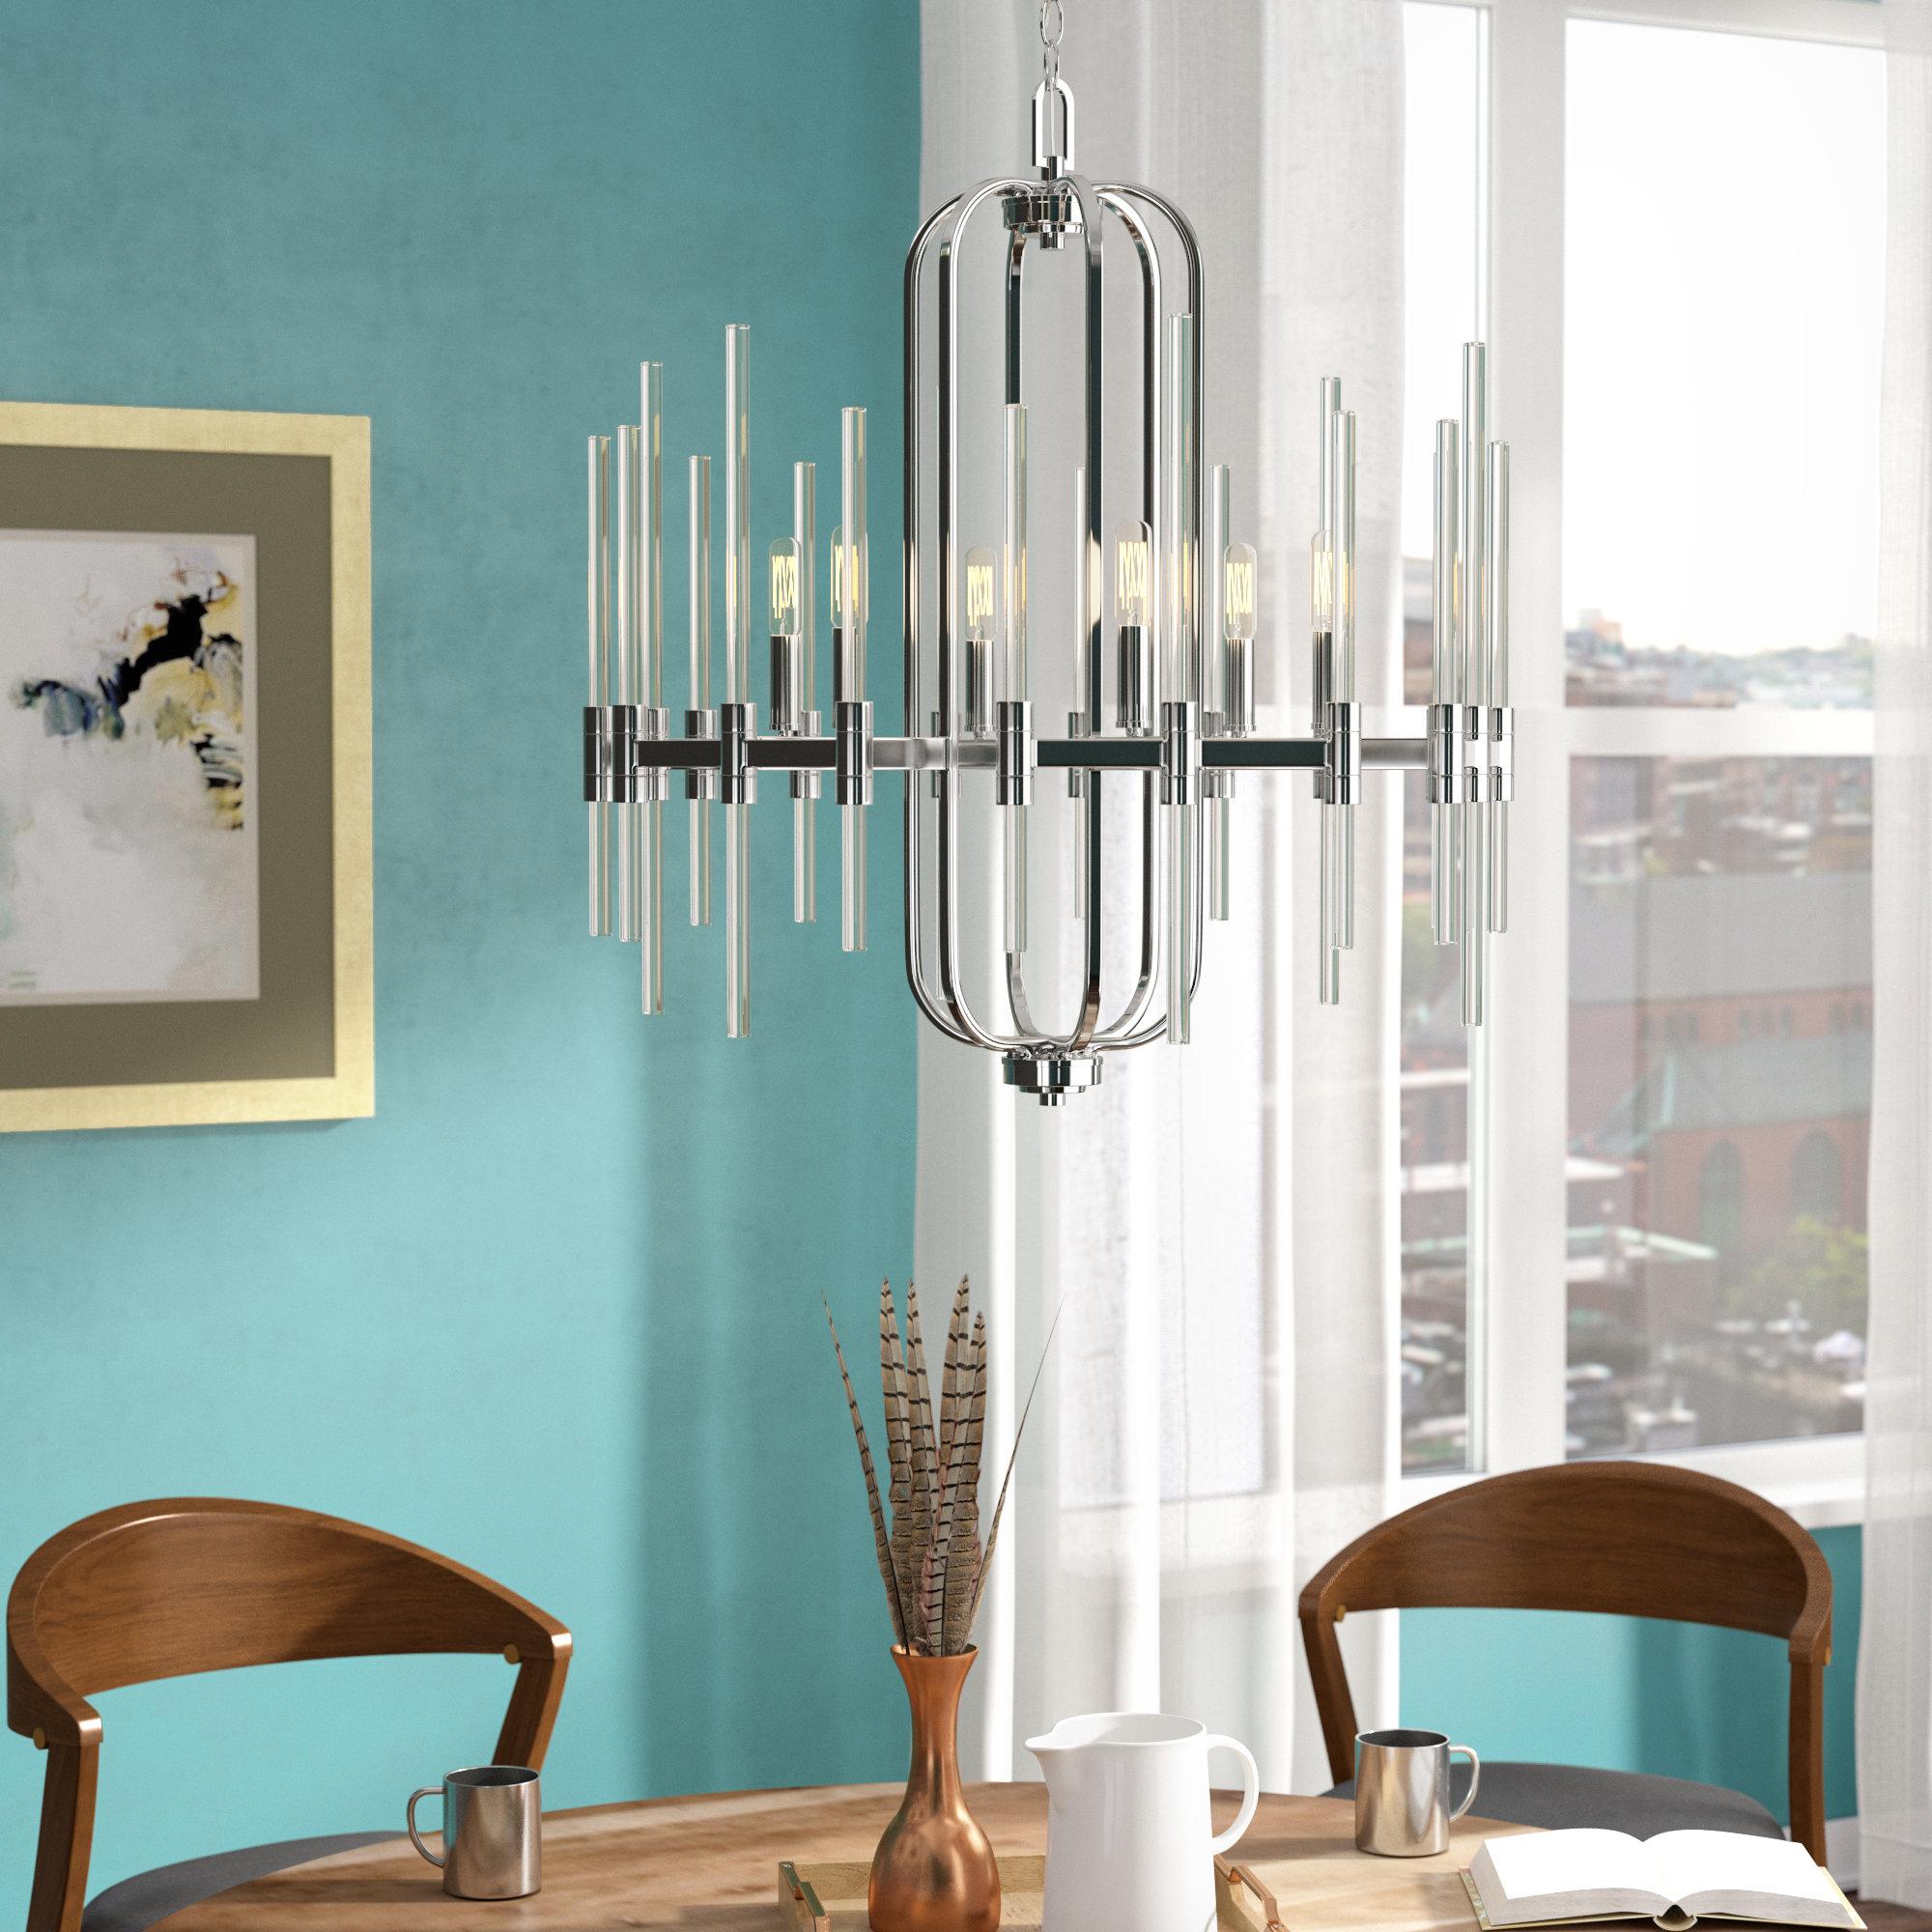 Brayden Studio Karn 6-Light Candle-Style Chandelier & Reviews   Wayfair